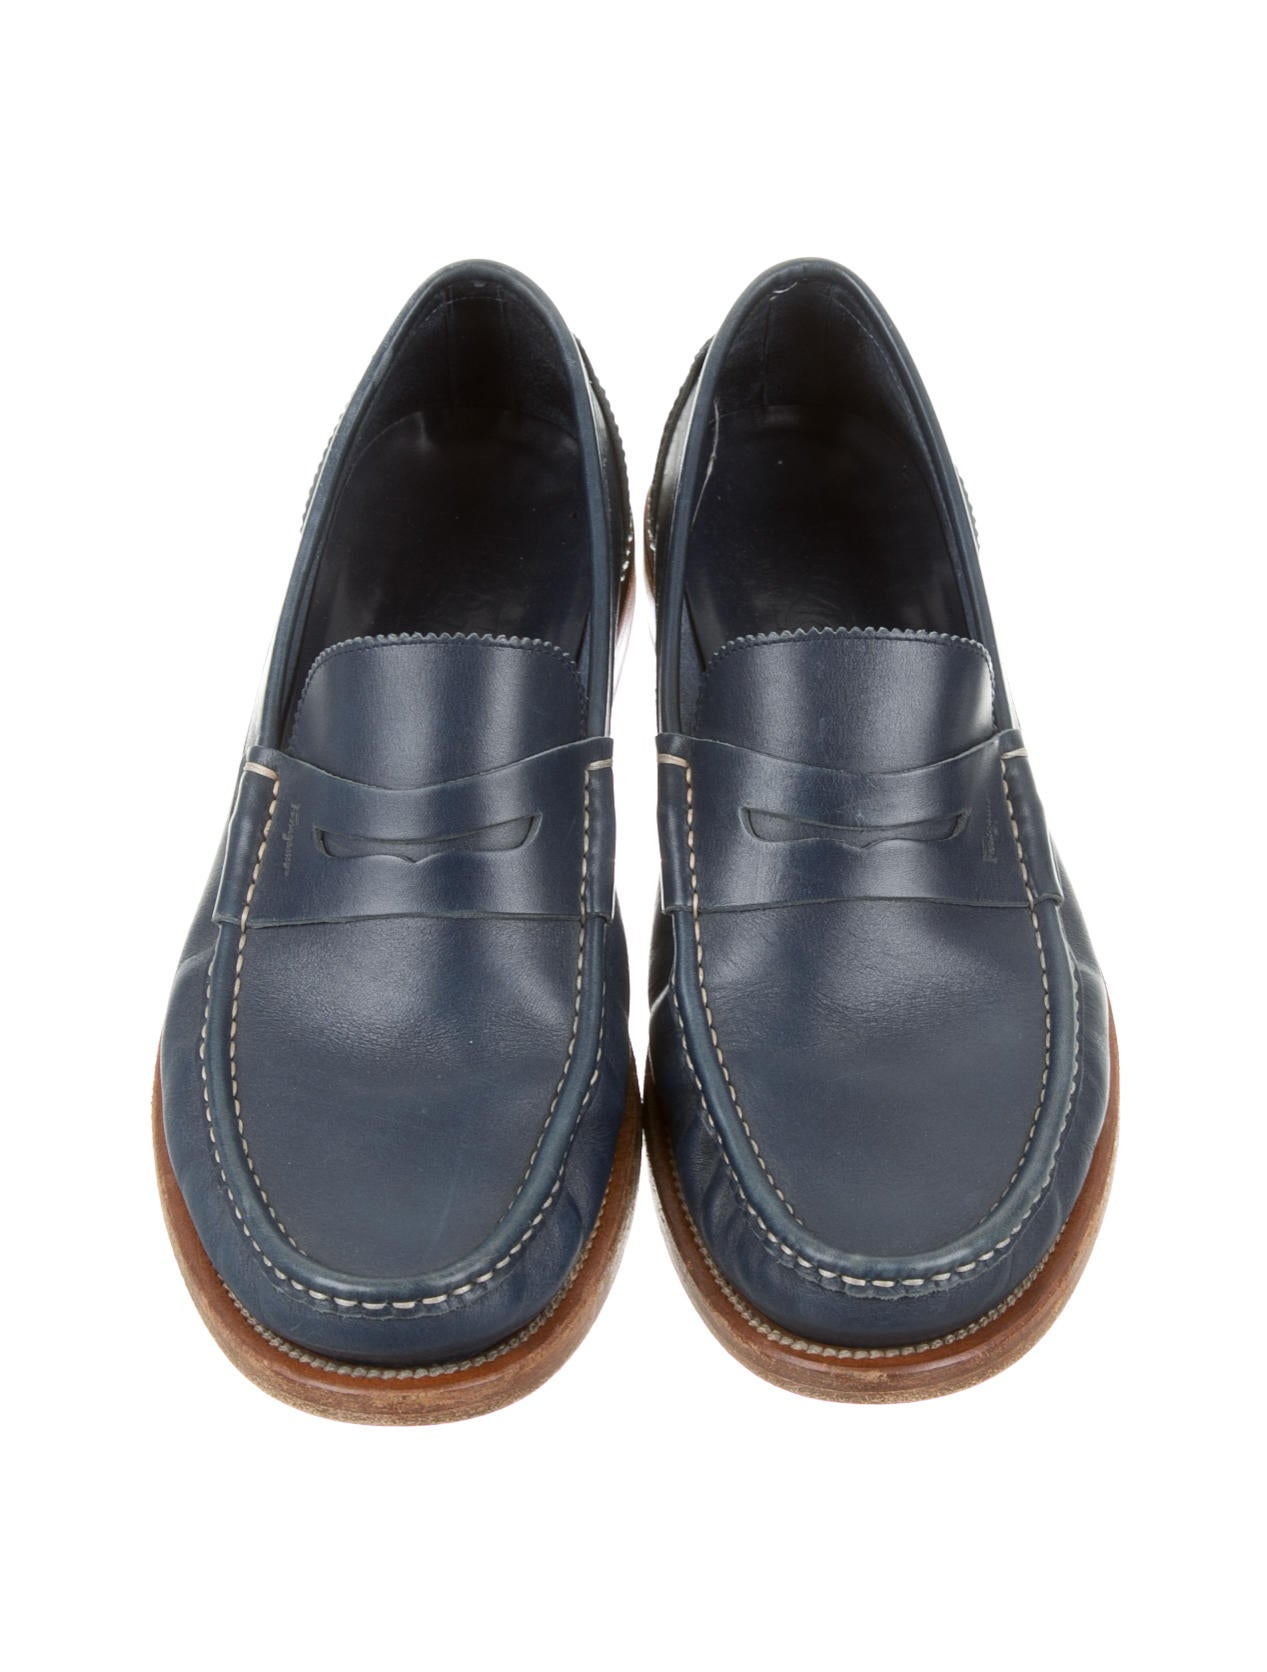 ferragamo loafers mens shoes - 28 images - salvatore